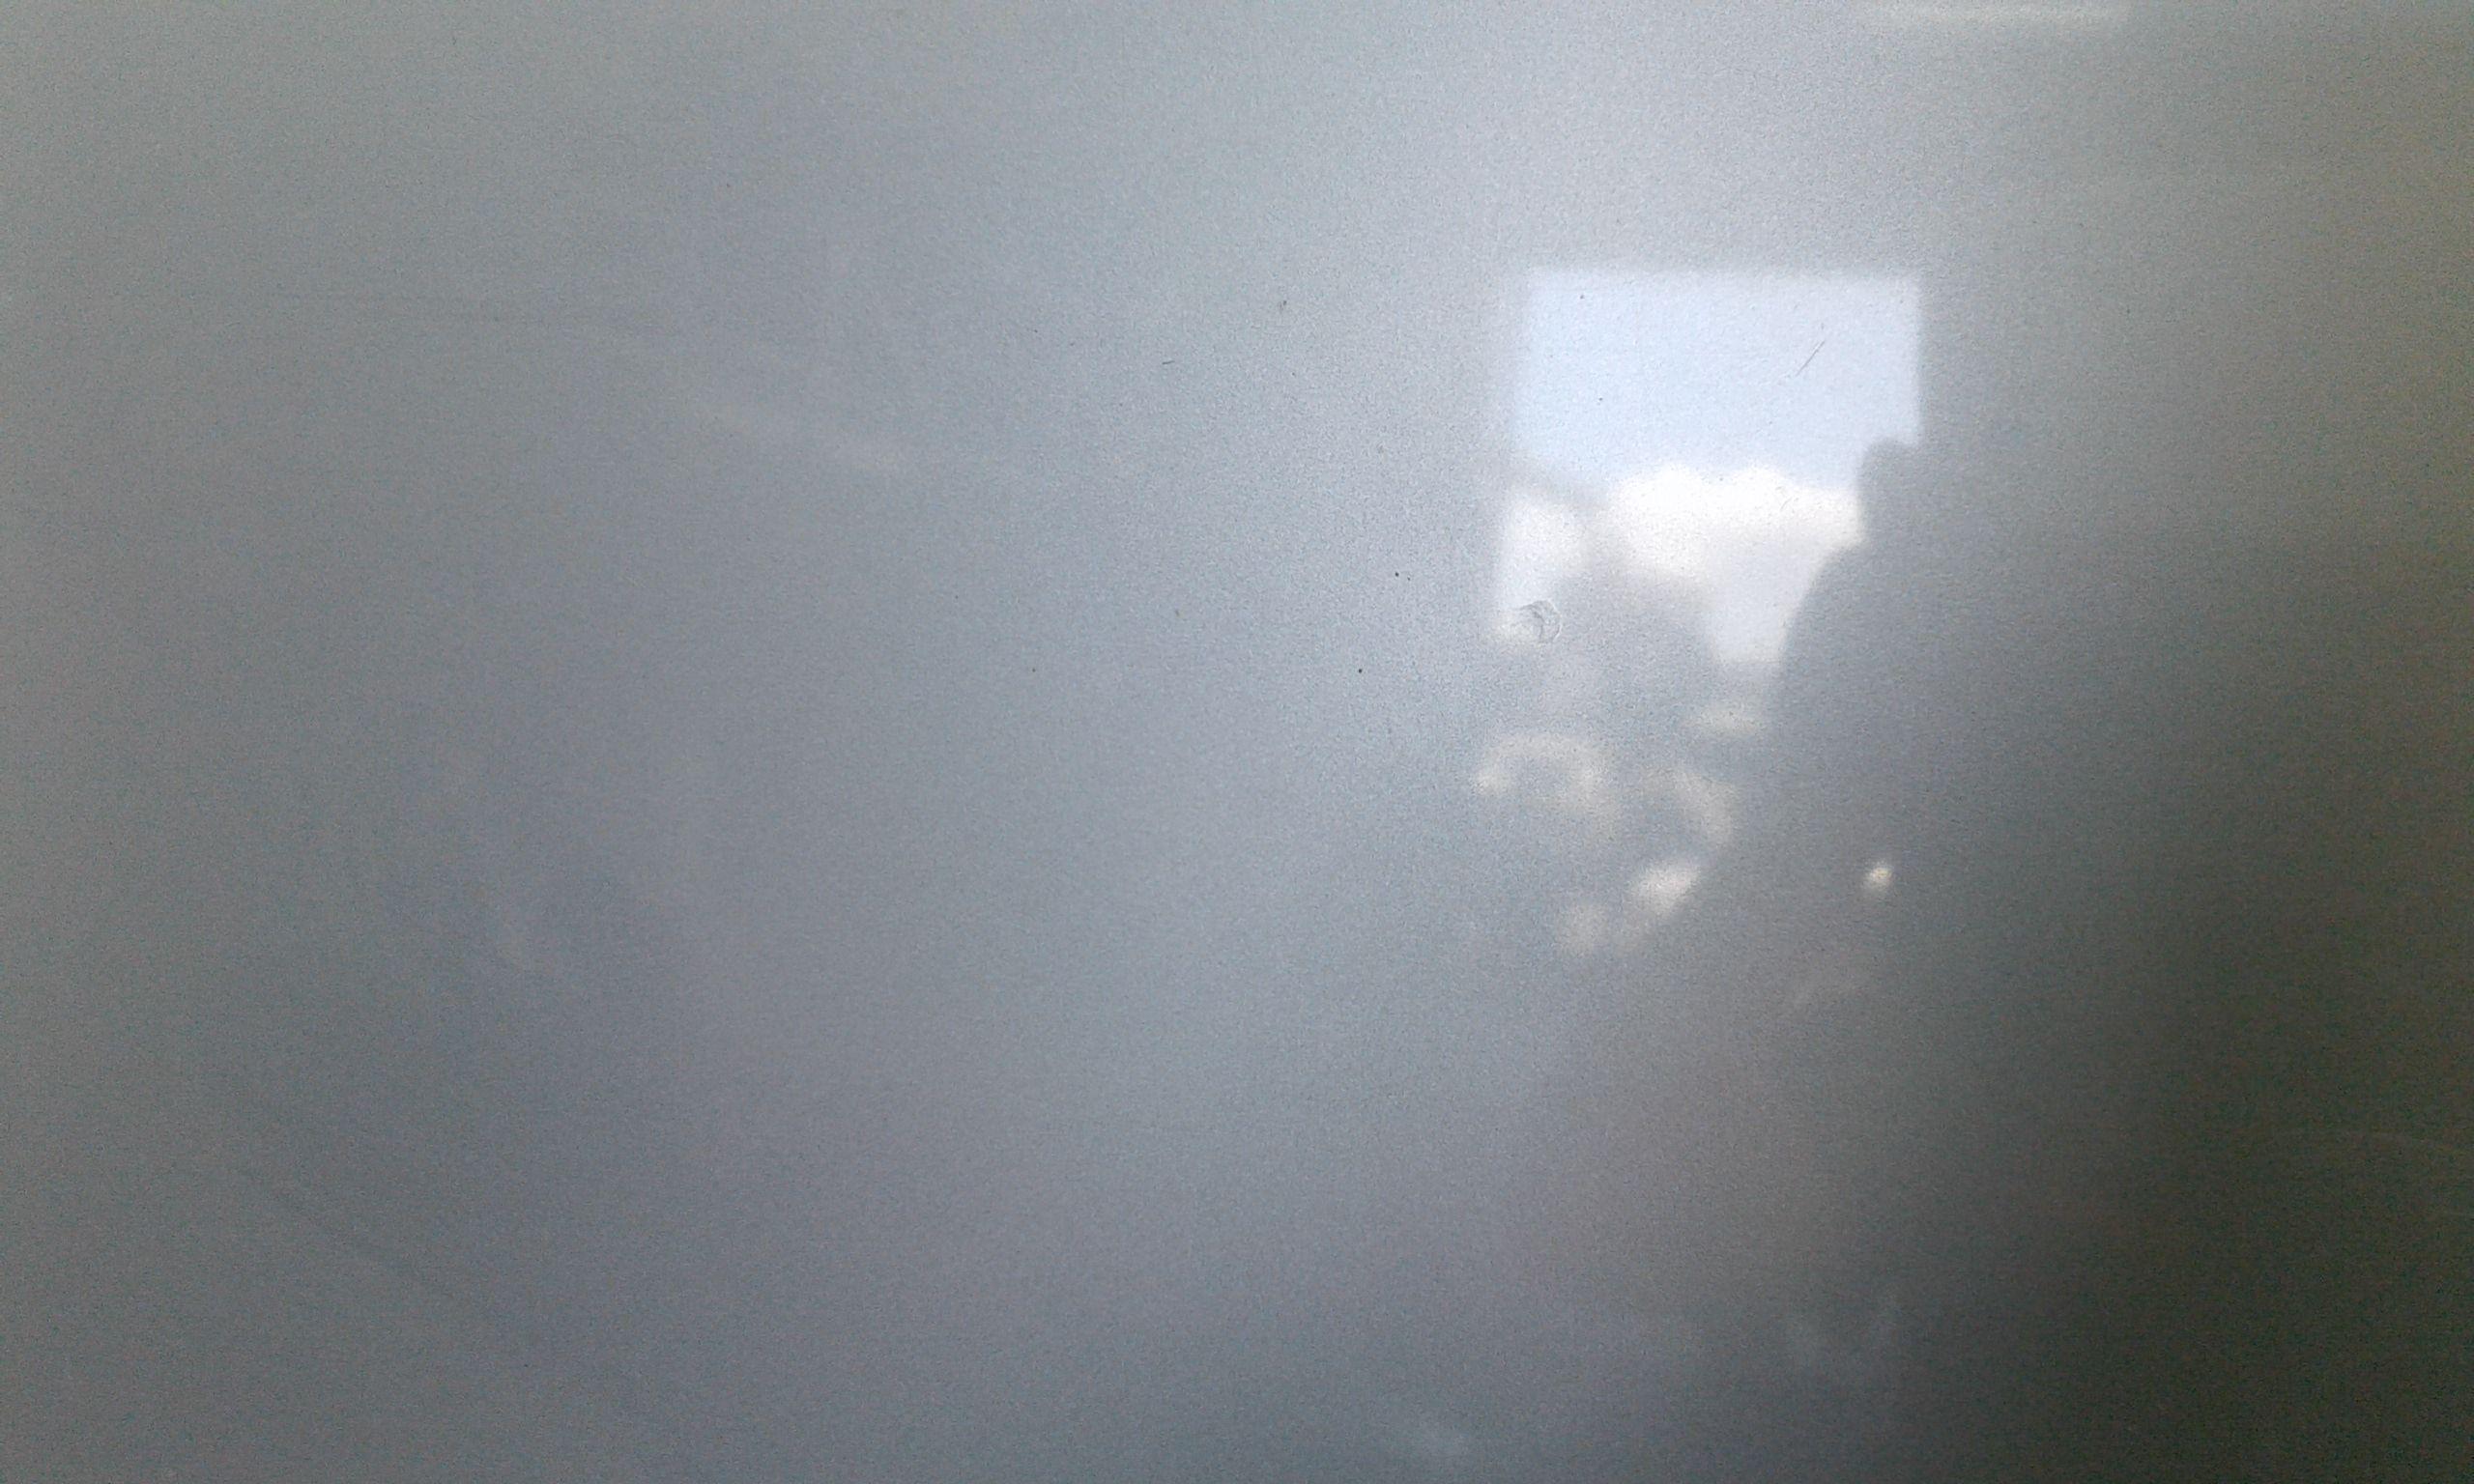 COFANO ANTERIORE HYUNDAI Accent 4° Serie  Benzina    (2006) RICAMBI USATI